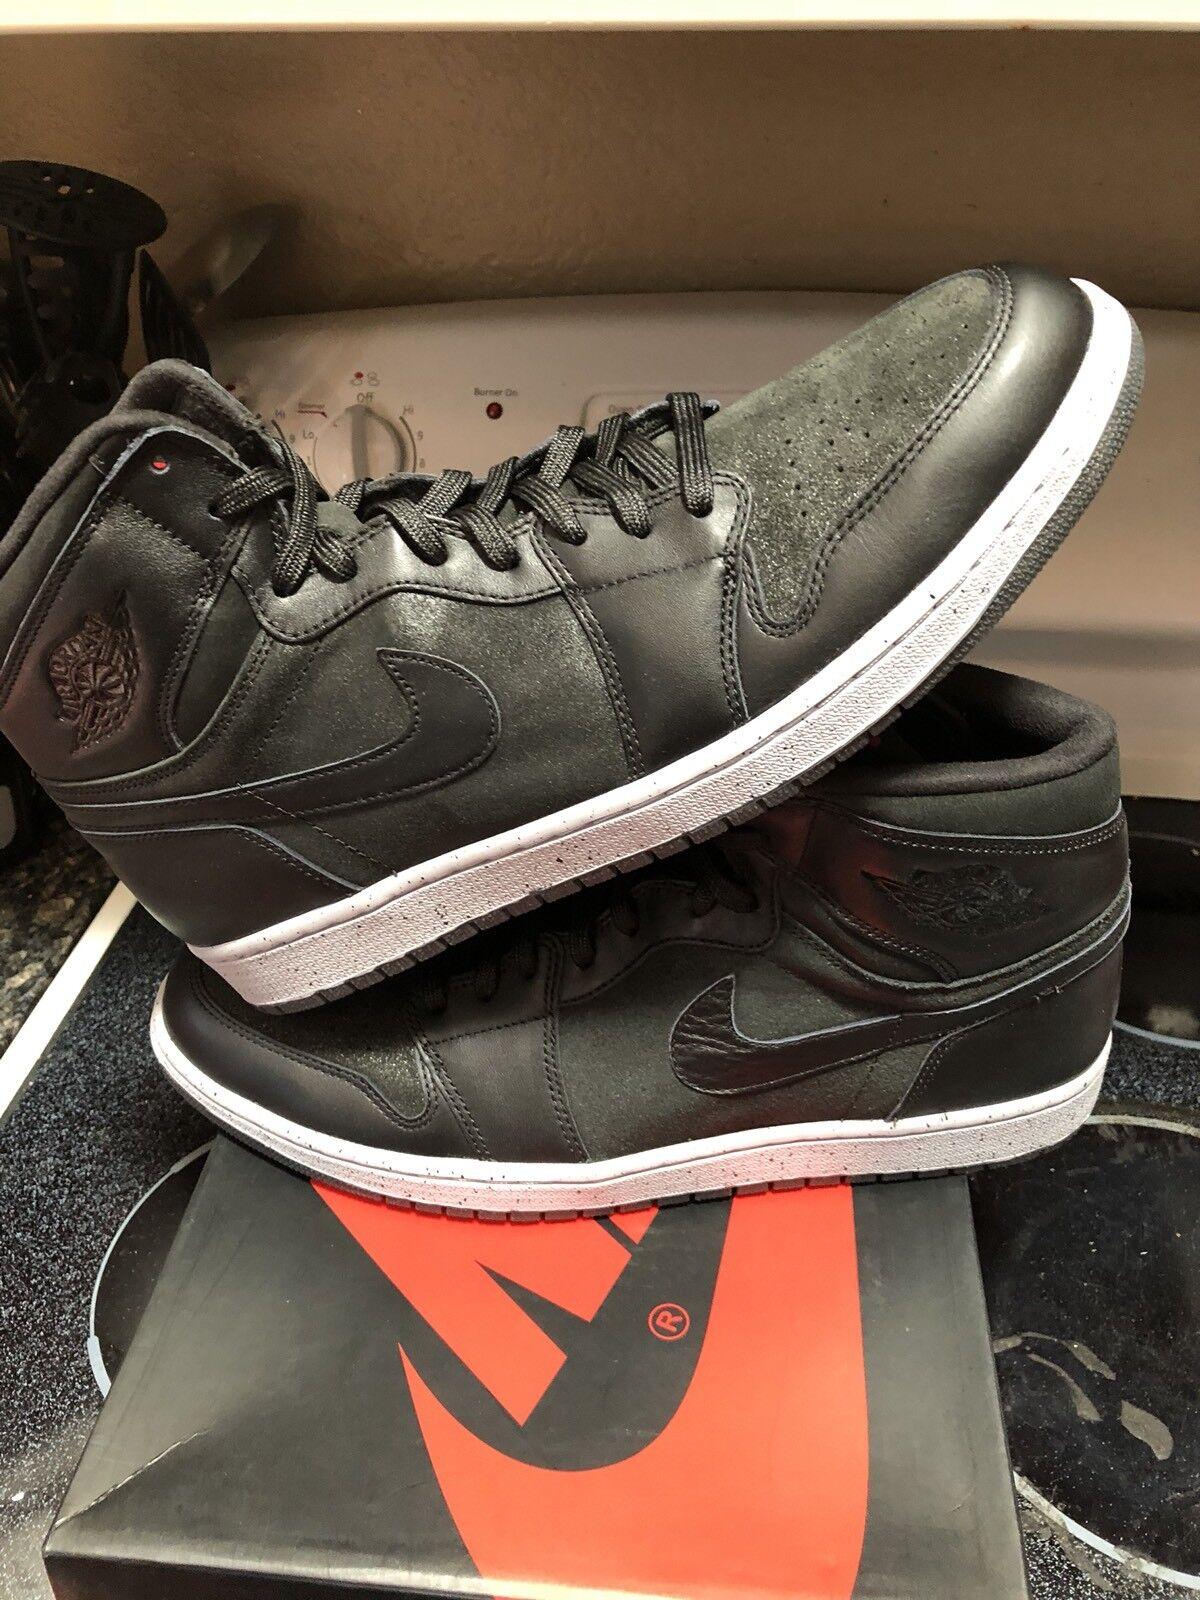 Nike Air Jordan 1 Retro High OG NYC (715060-002) PSNY Black SZ 15 (715060-002) NYC Xi Xii Max 97 5082e1